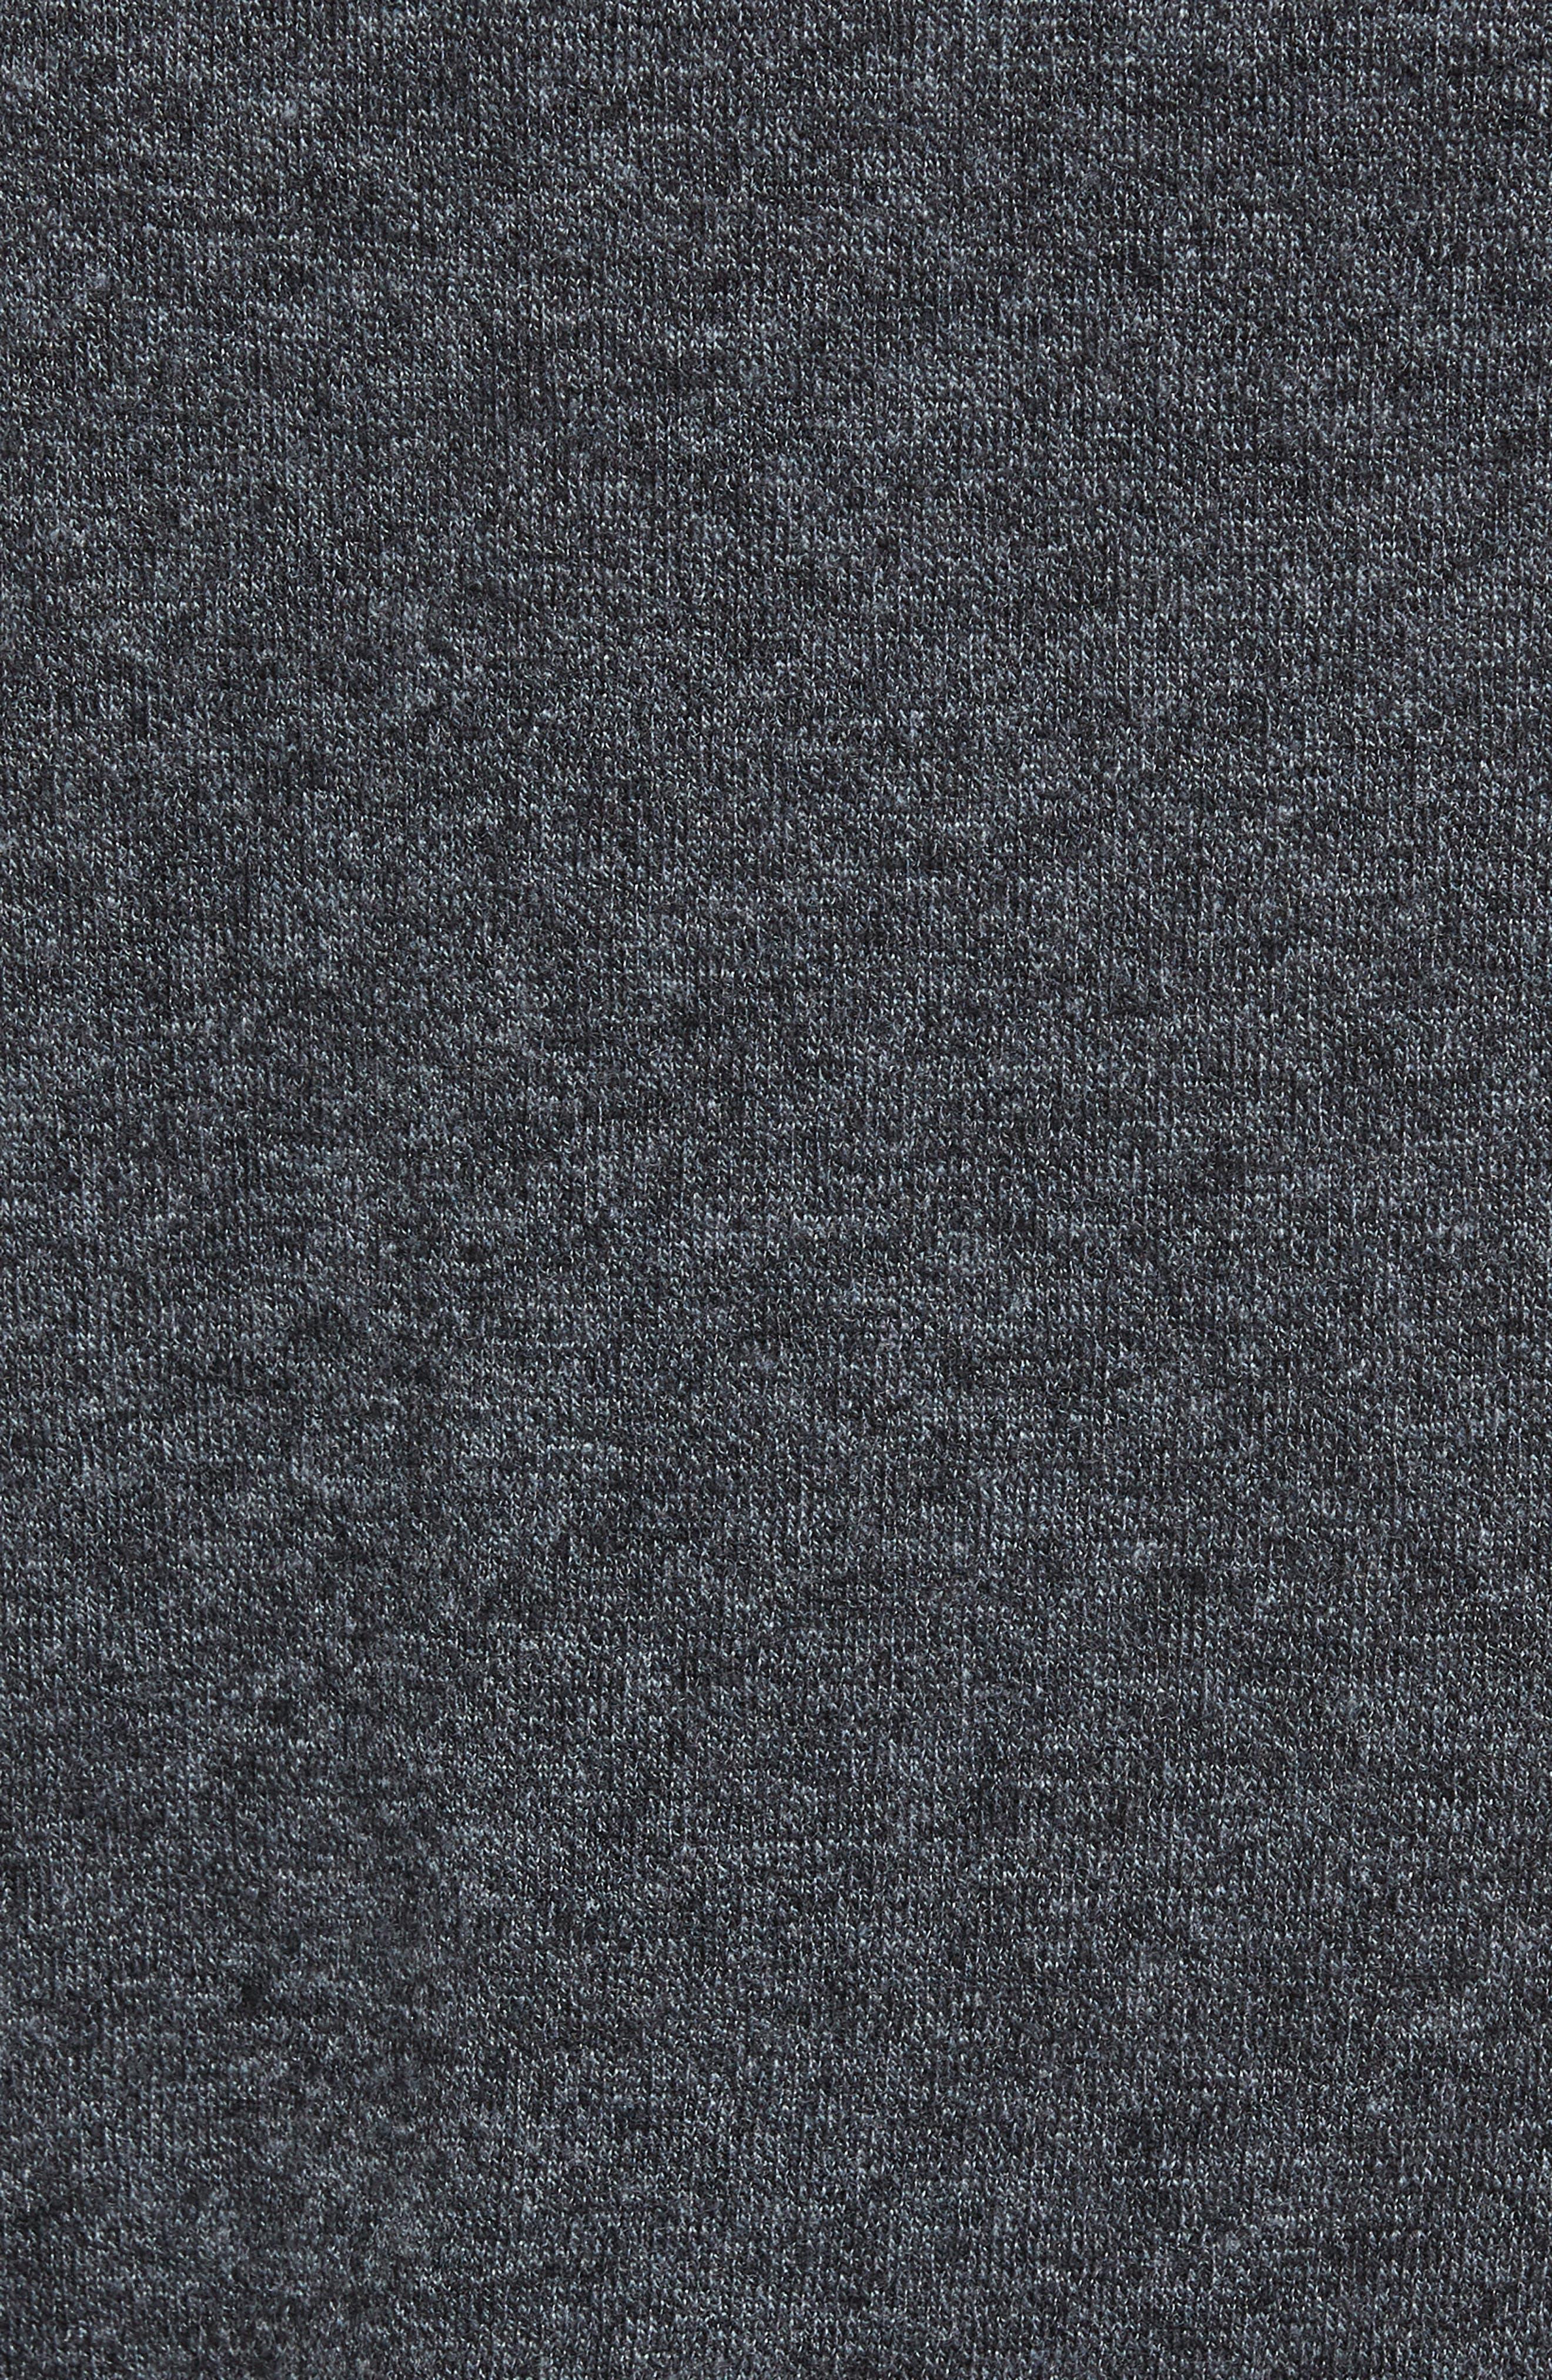 Norpol Crewneck Sweater,                             Alternate thumbnail 17, color,